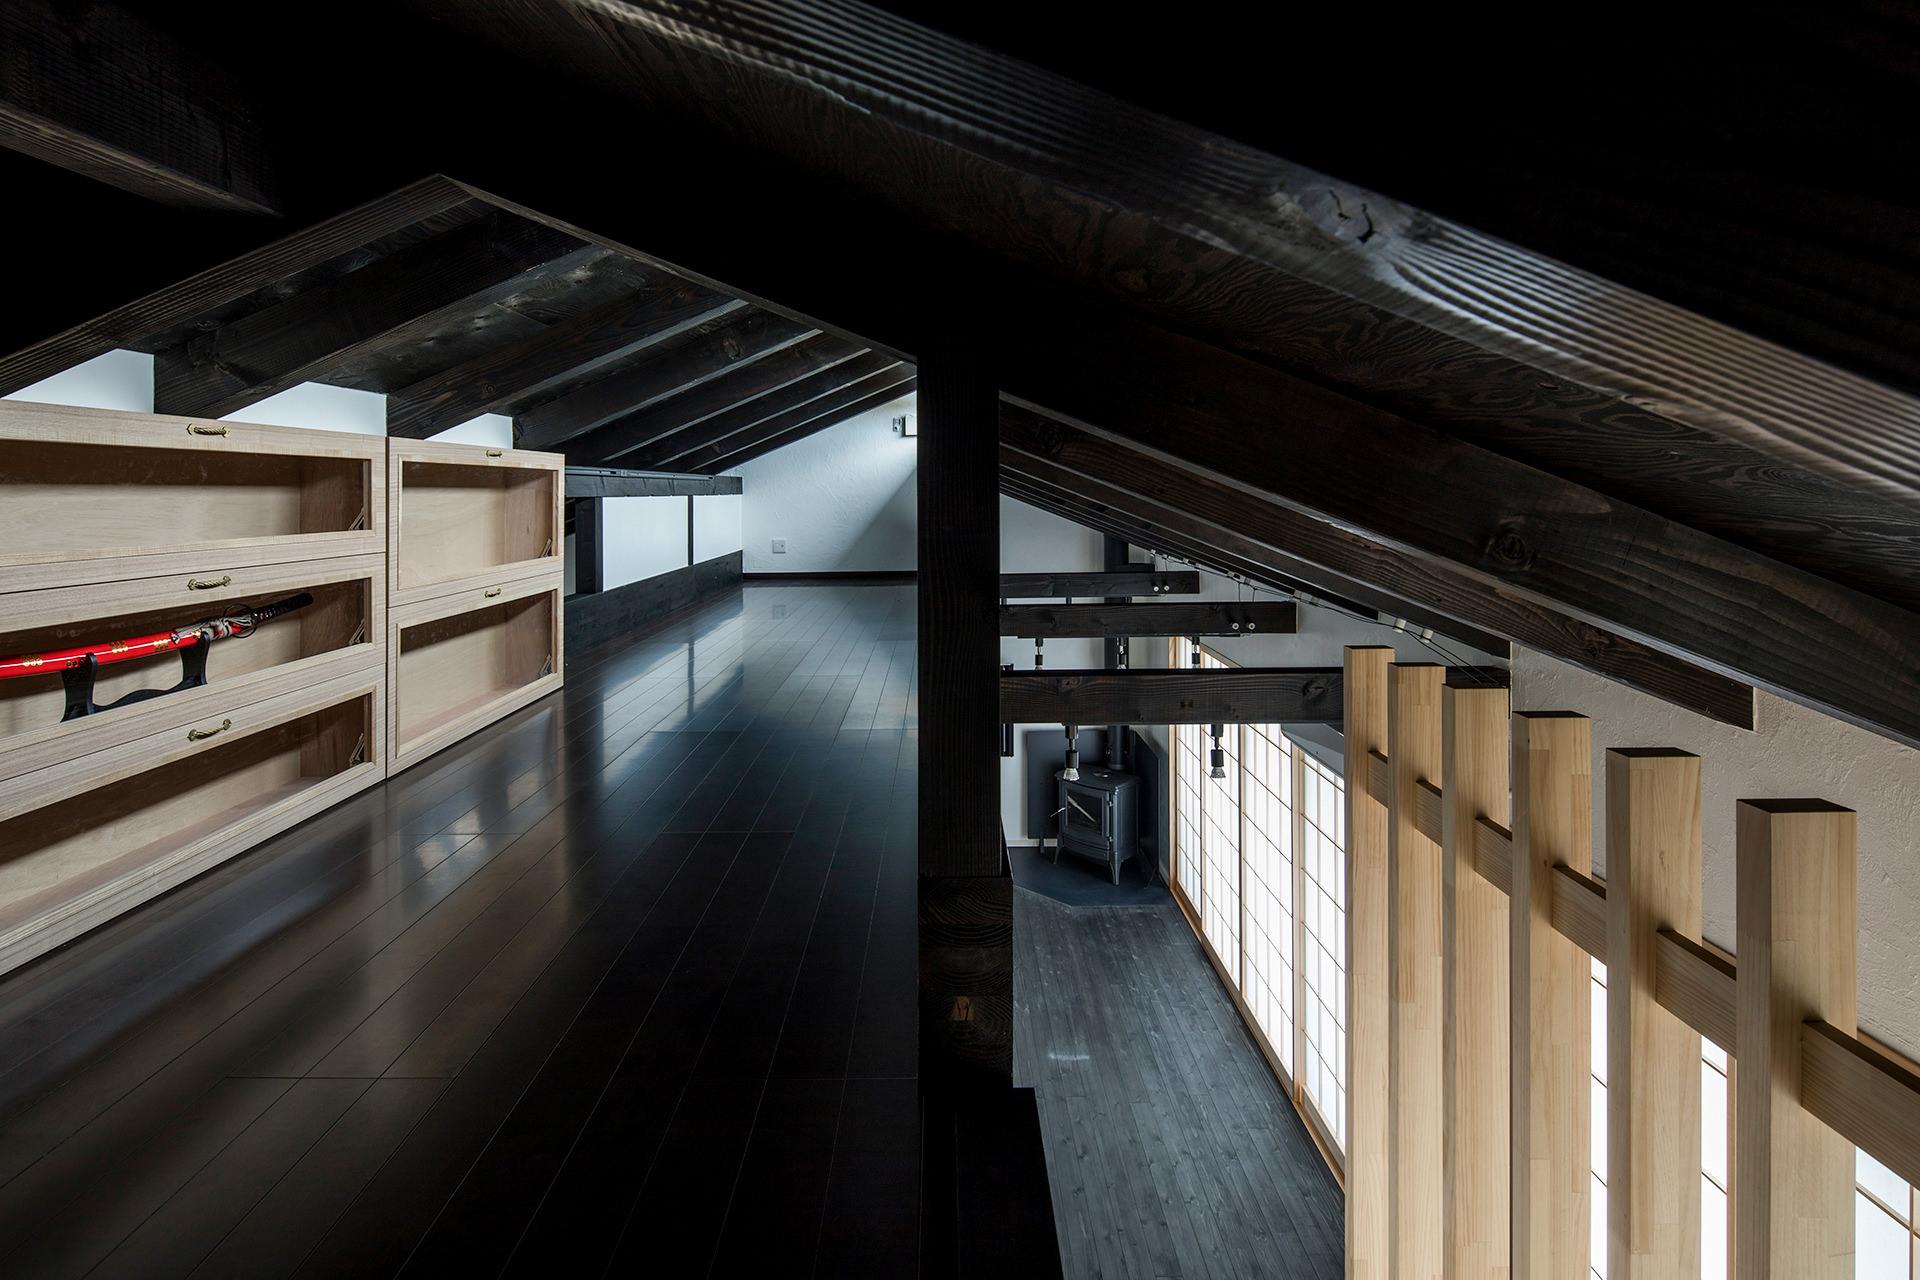 「西八王子の家」 イメージ15 撮影:東涌写真事務所・東涌宏和